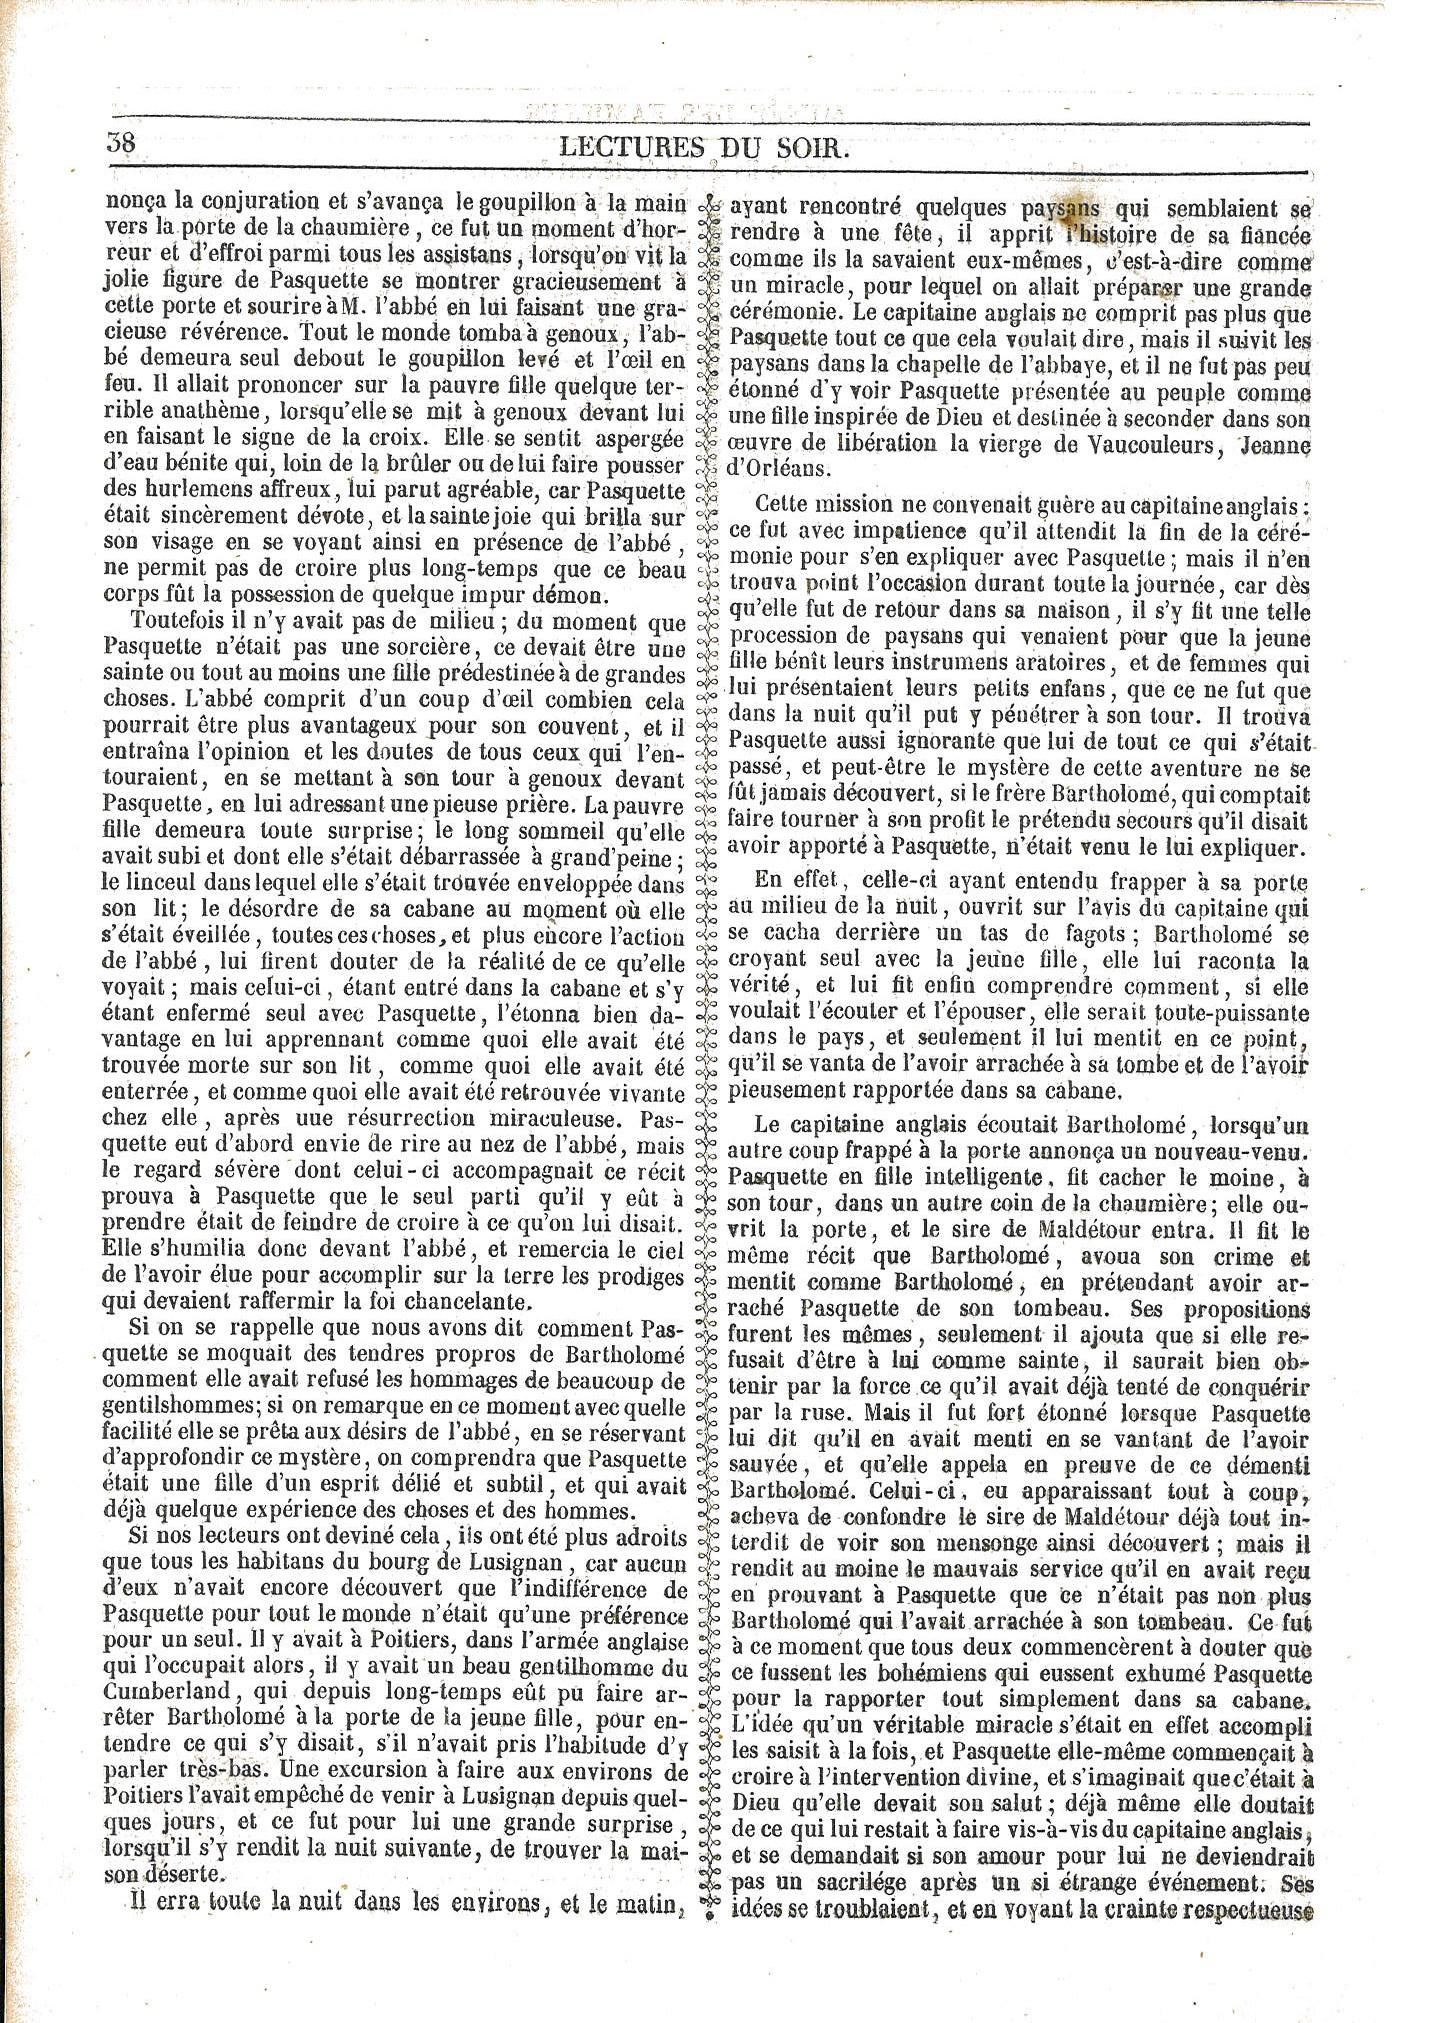 p.38.jpg - image/jpeg